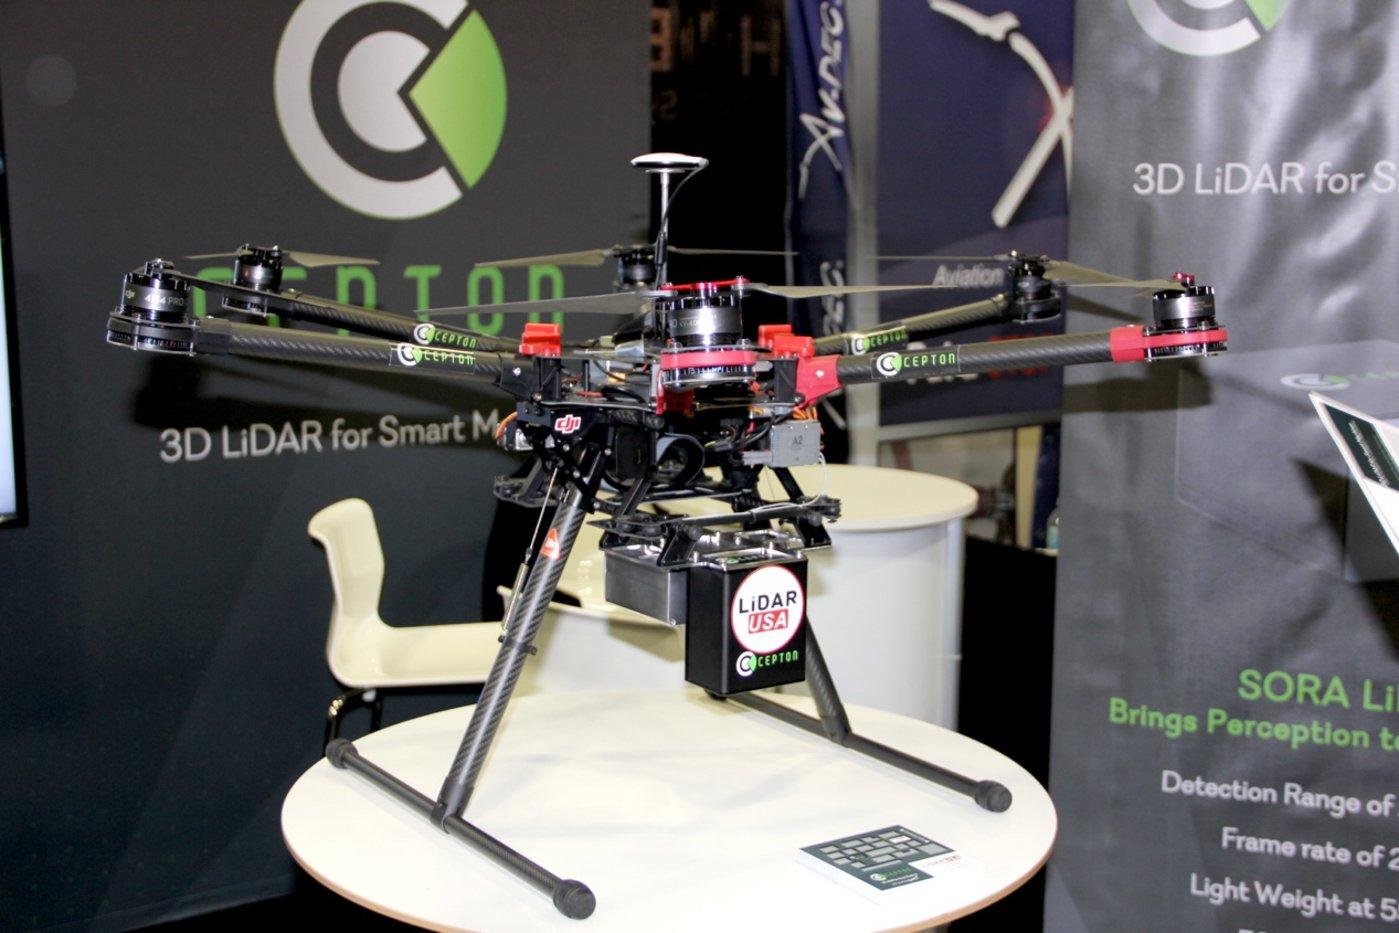 Cepton SORA200 应用于无人机上